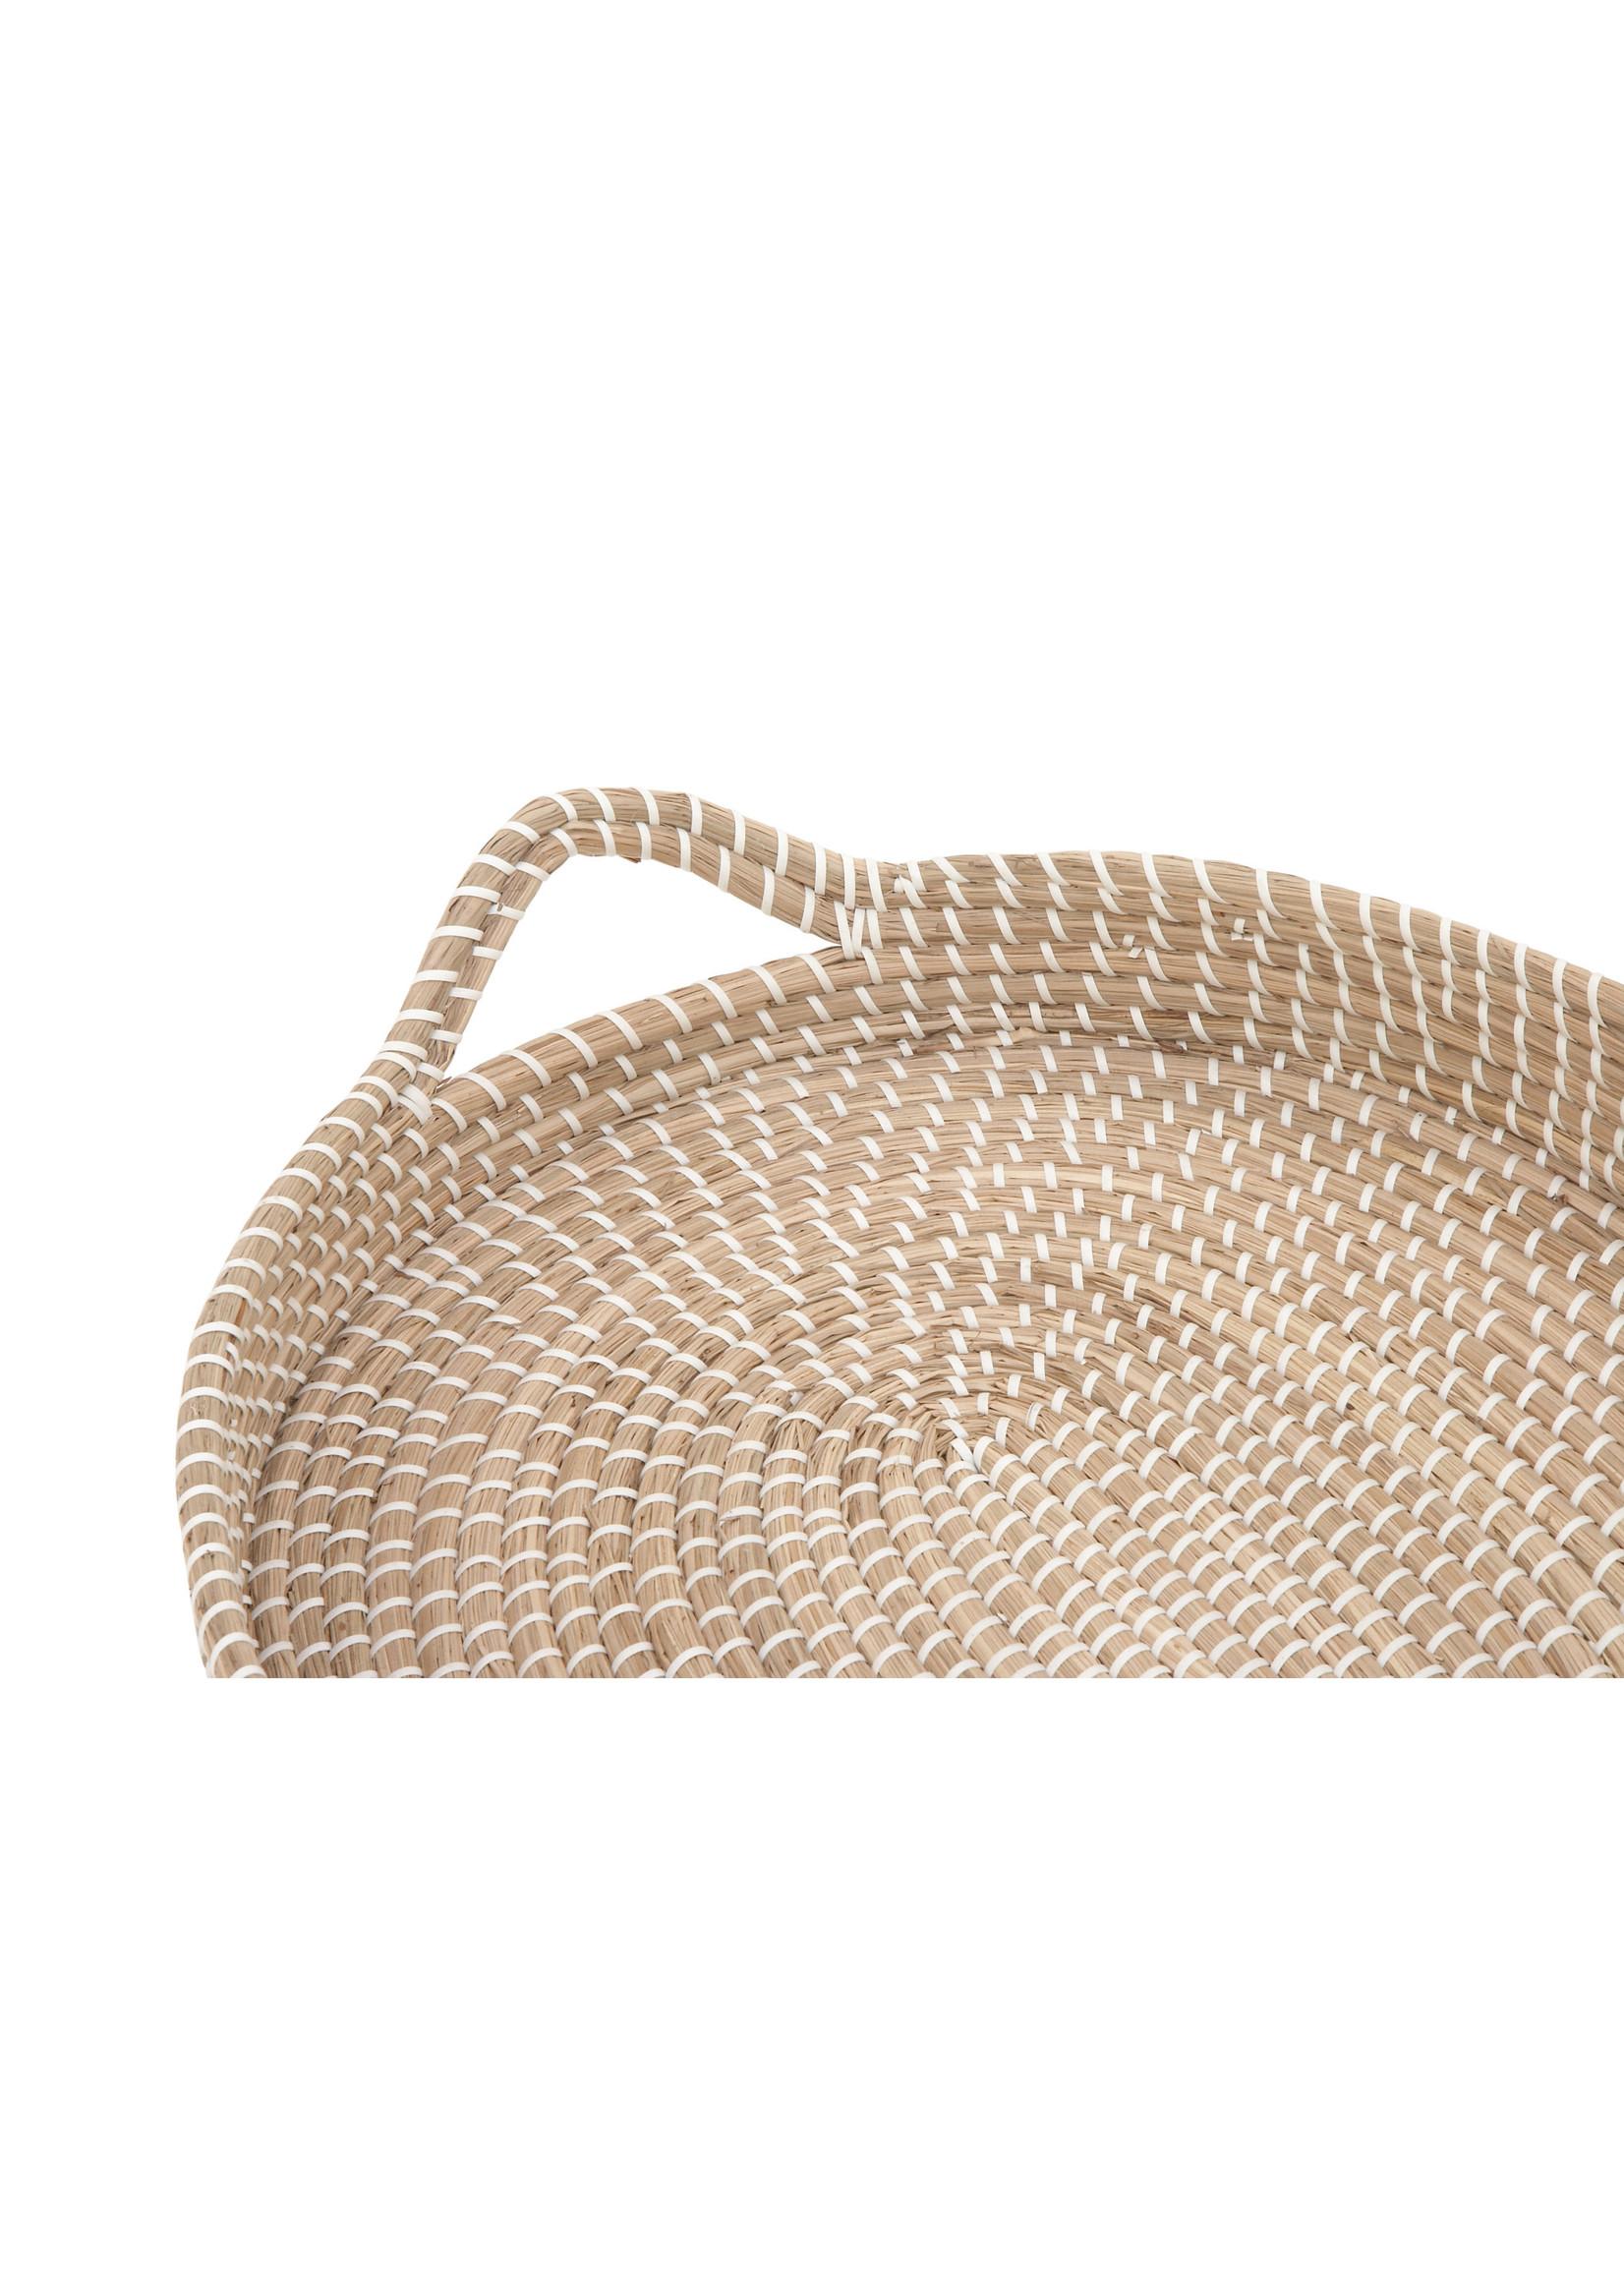 UMA Enterprises Seagrass Tray - Large